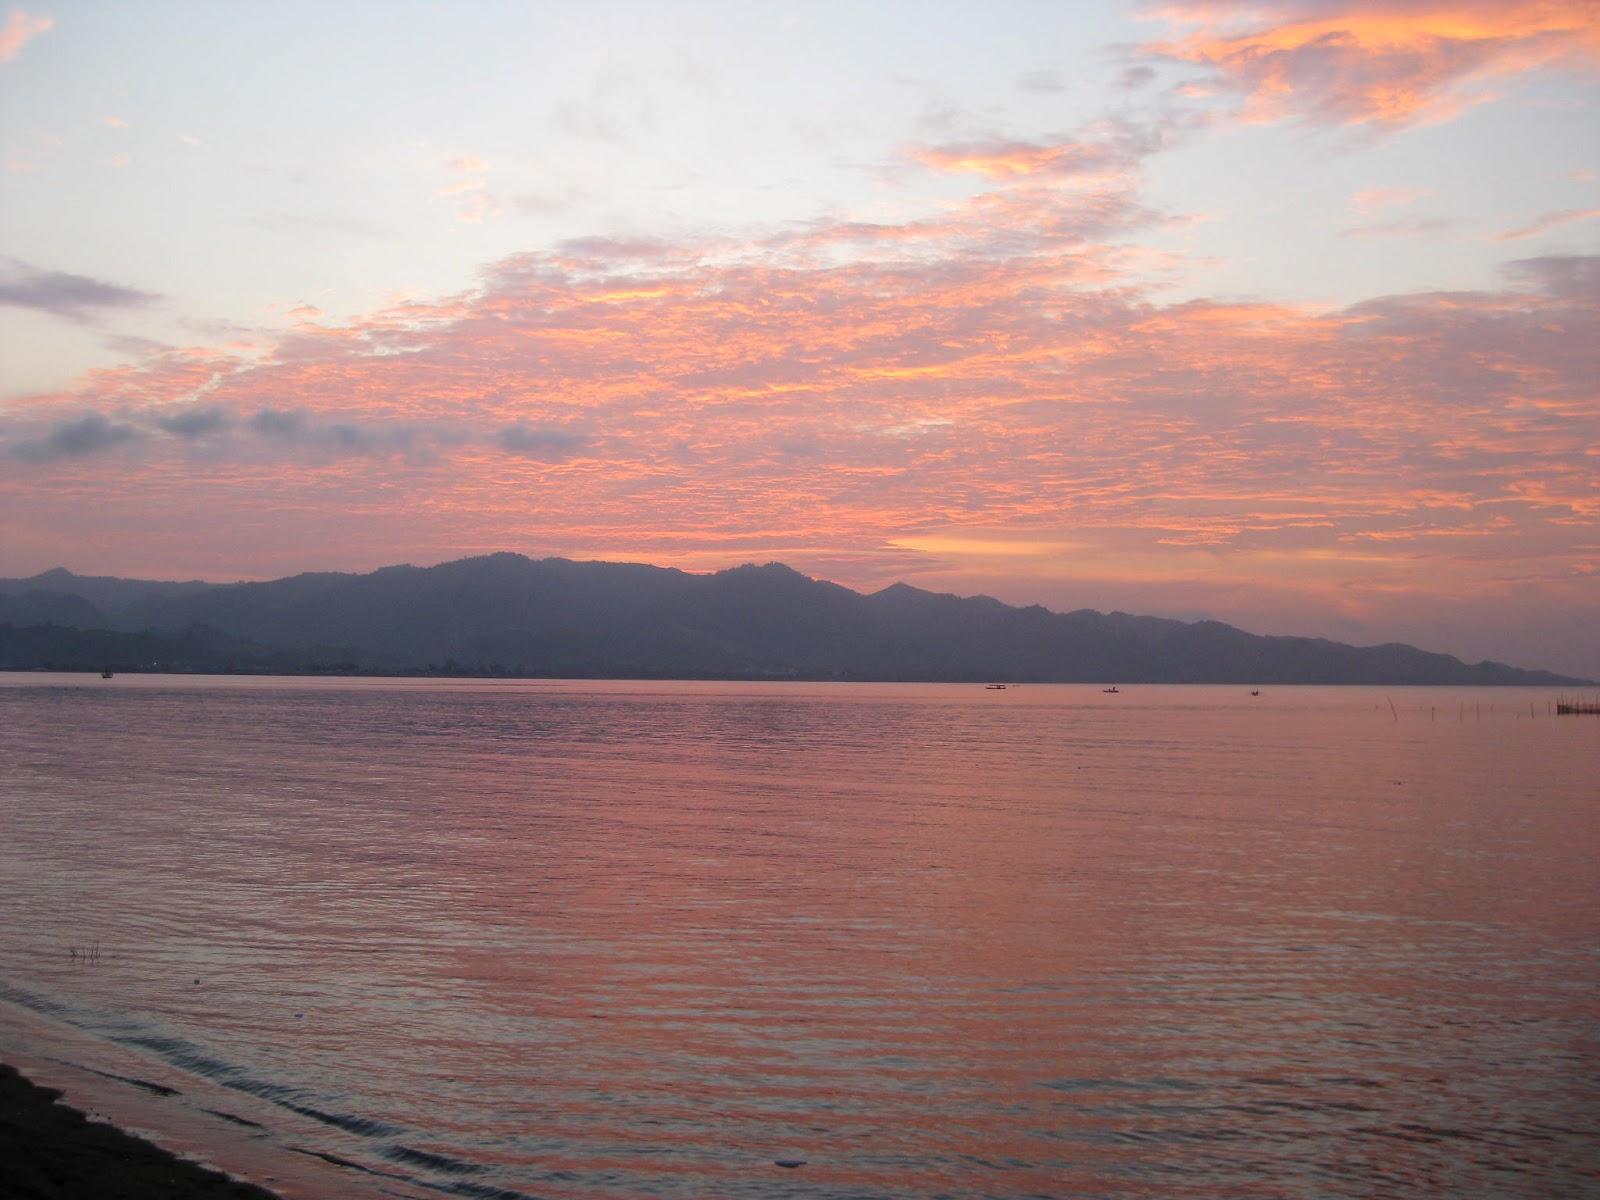 pantai manakarra mamuju sulawesi barat